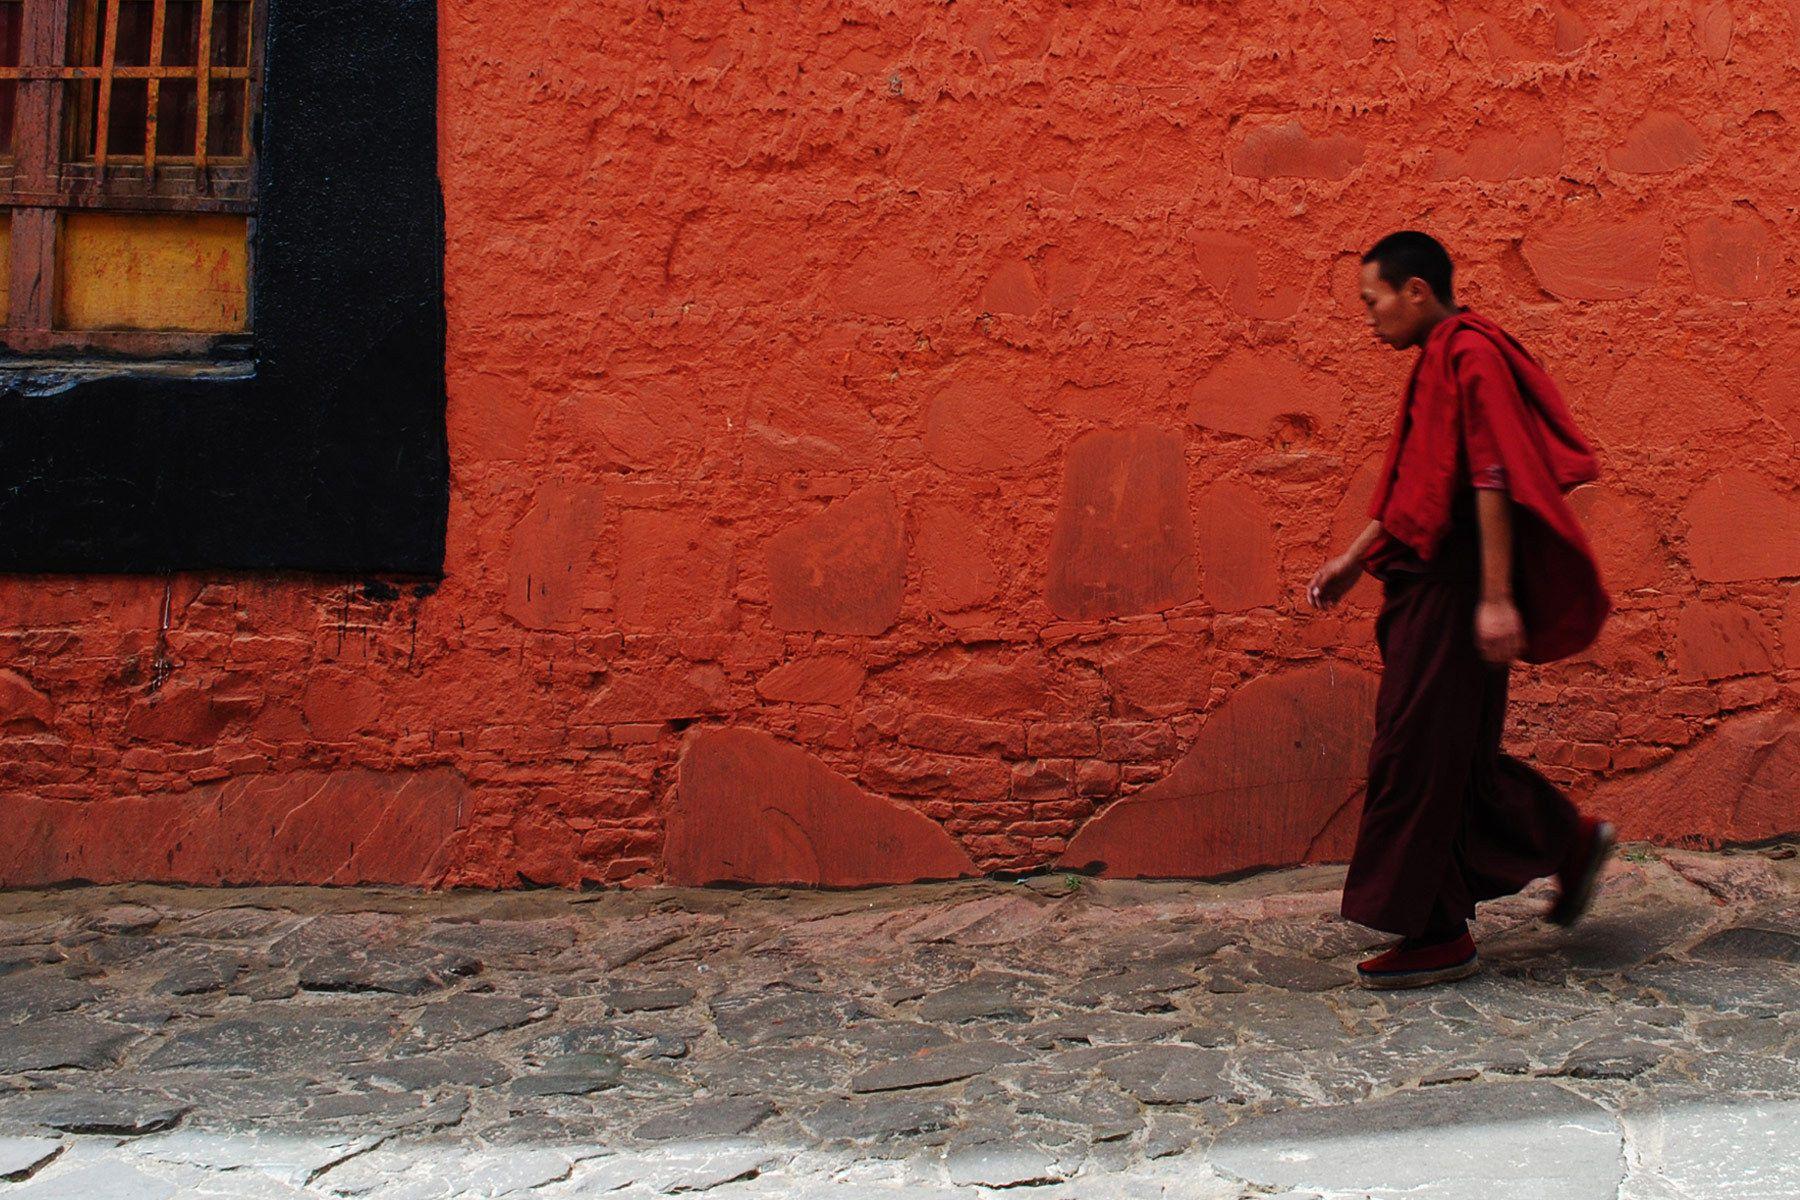 101___tibet_monk_buddhist_buddhism_budista_monje.jpg